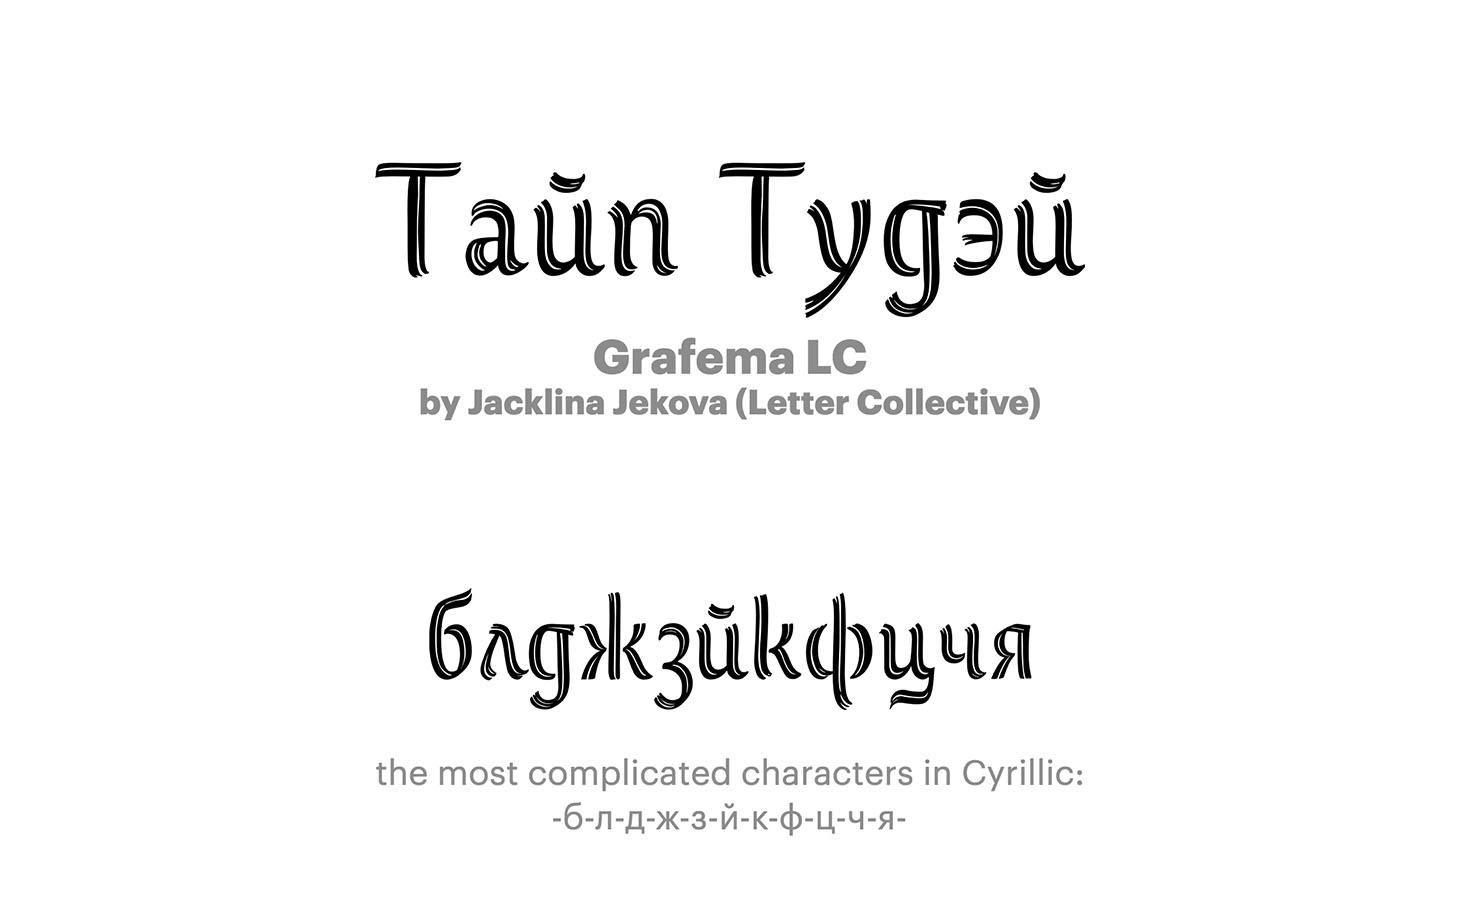 Grafema-LC